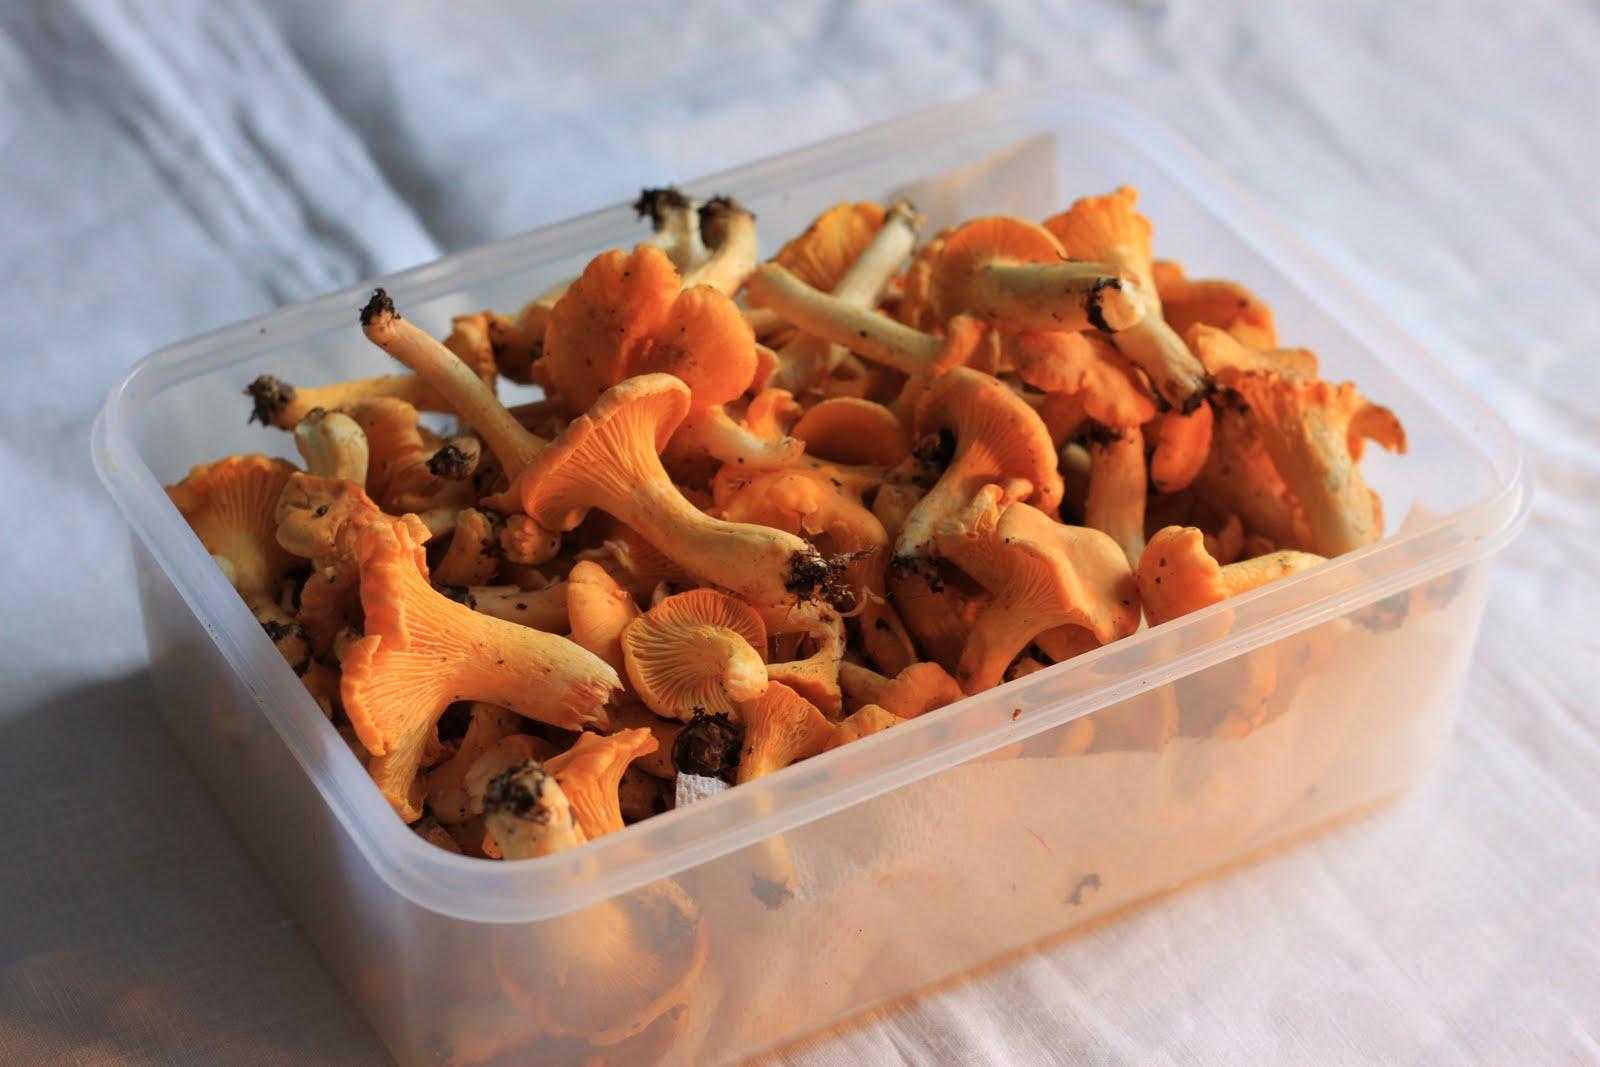 Twice Bitten: Mushroom hunting part 2: the ubiquitous wild mushroom ...